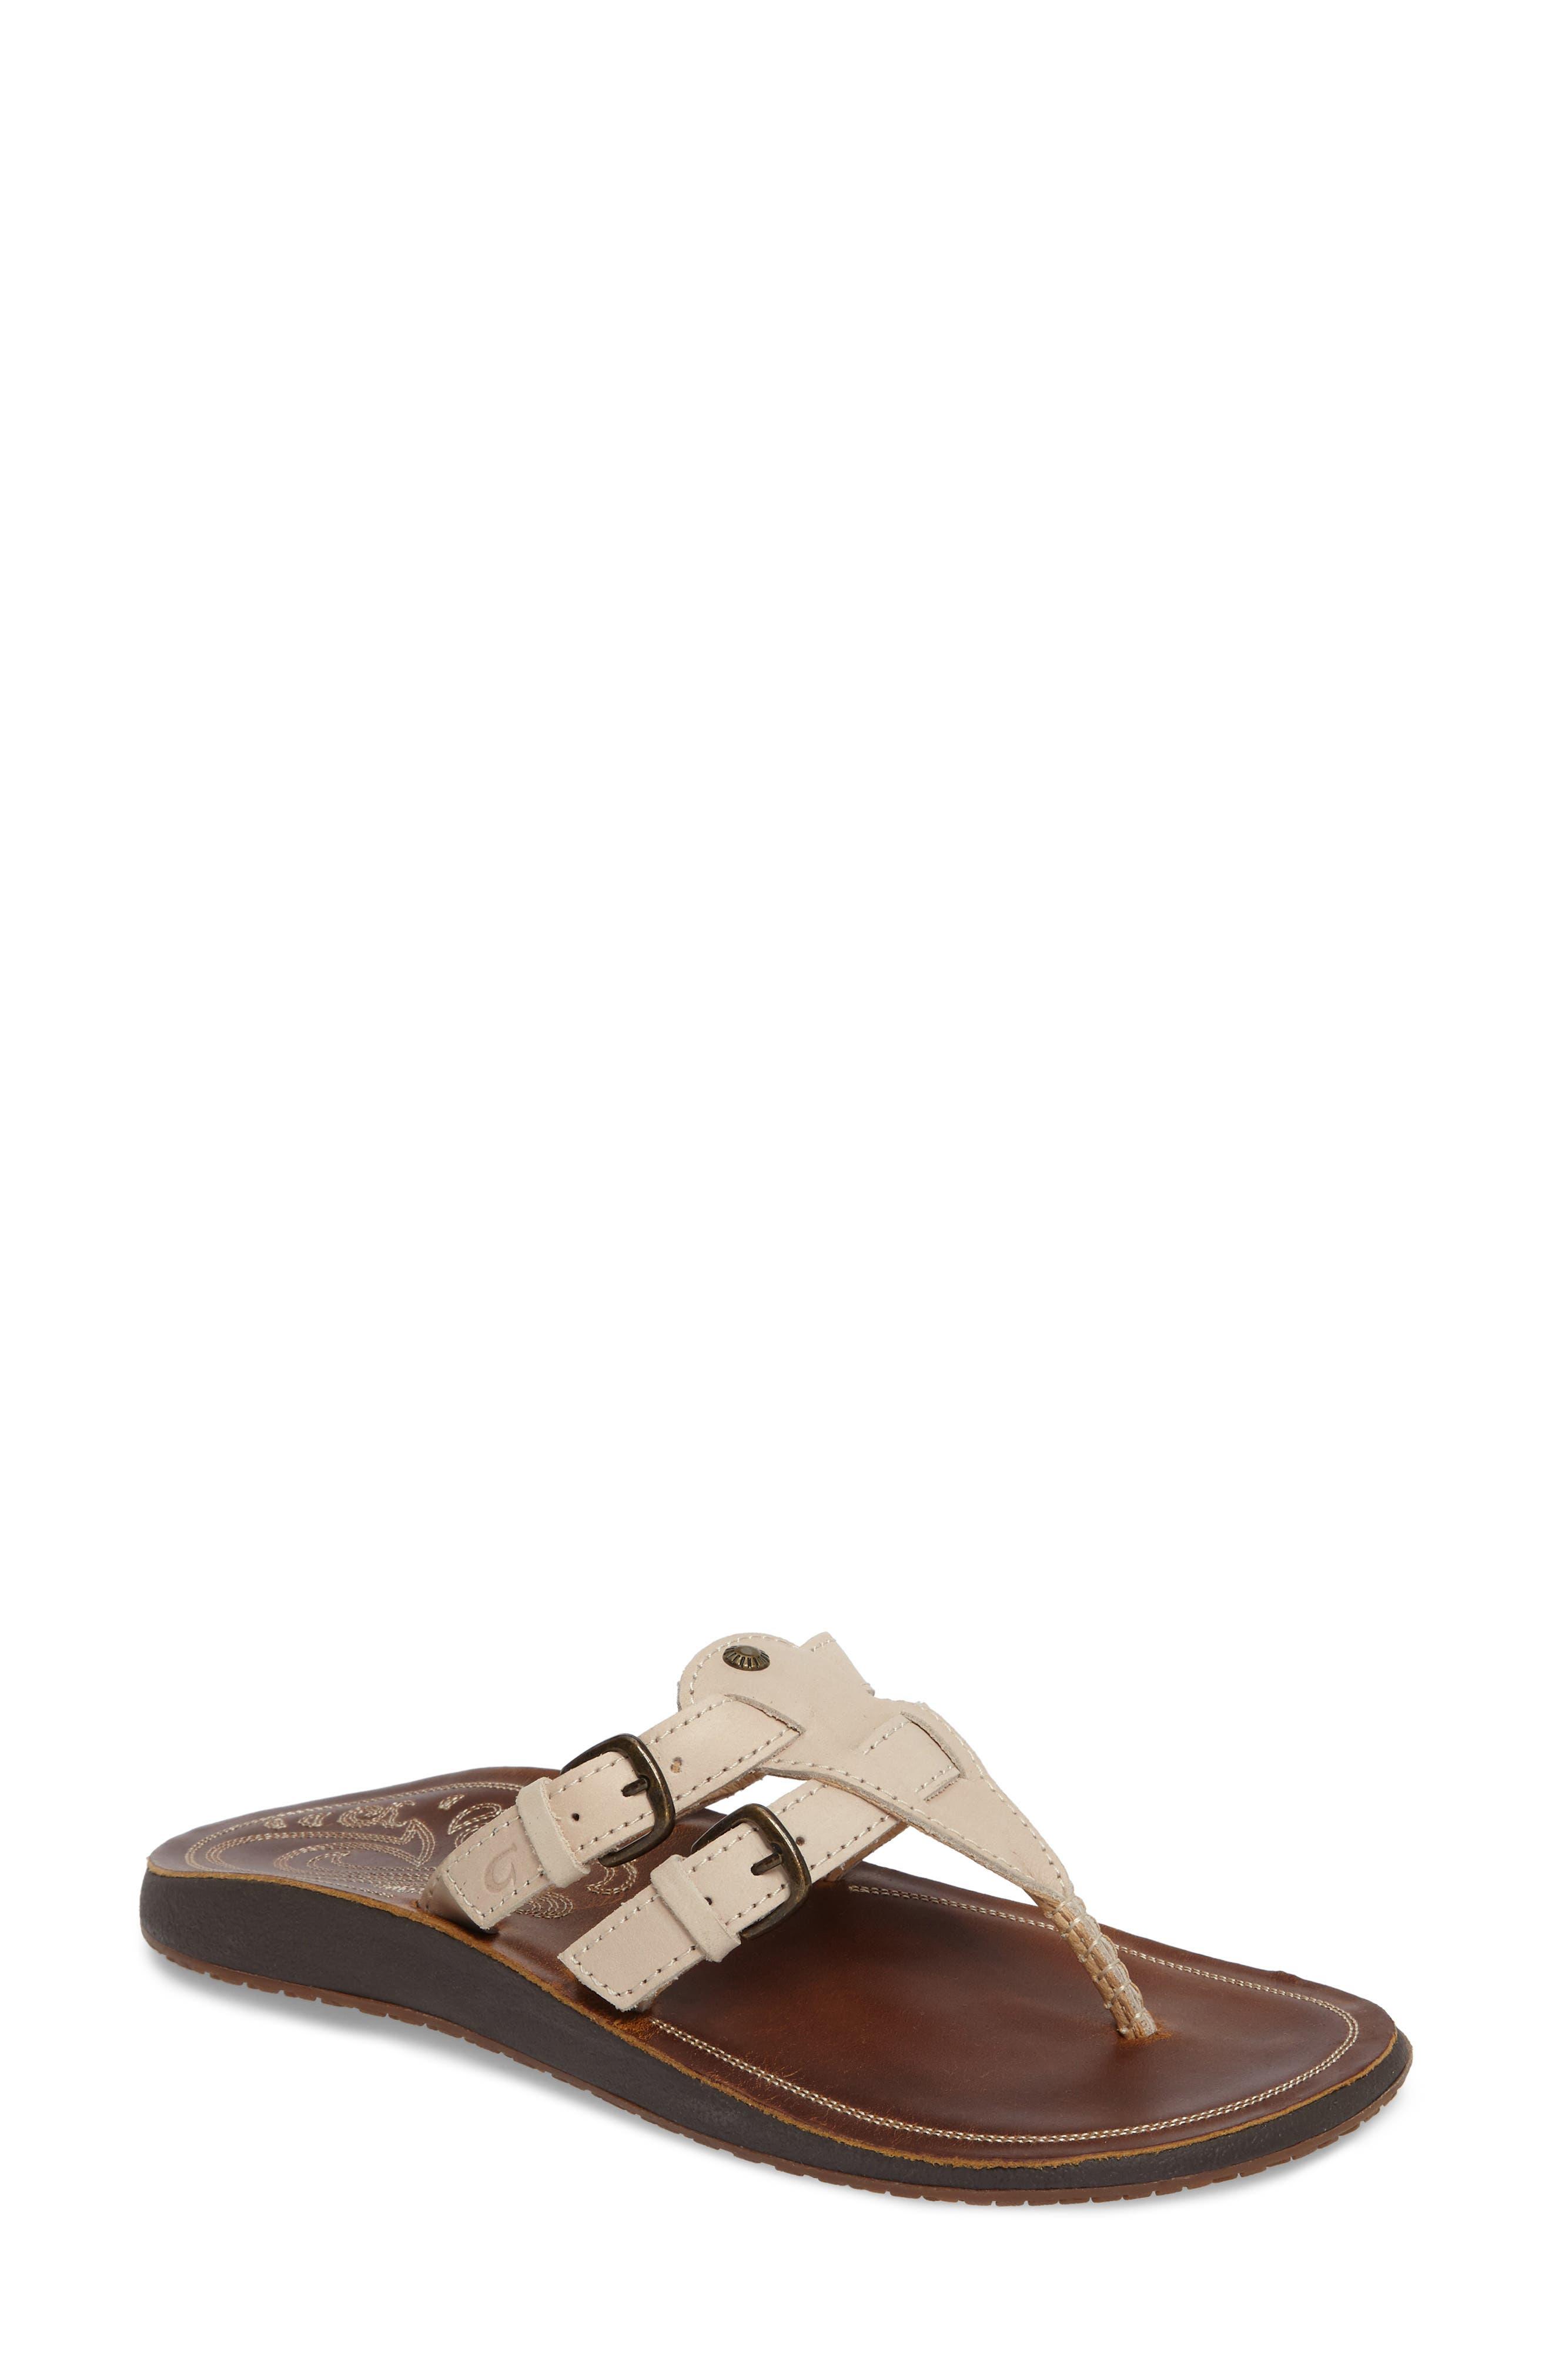 Honoka'a Buckle Flip Flop,                             Main thumbnail 1, color,                             Tapa/ Sahara Leather